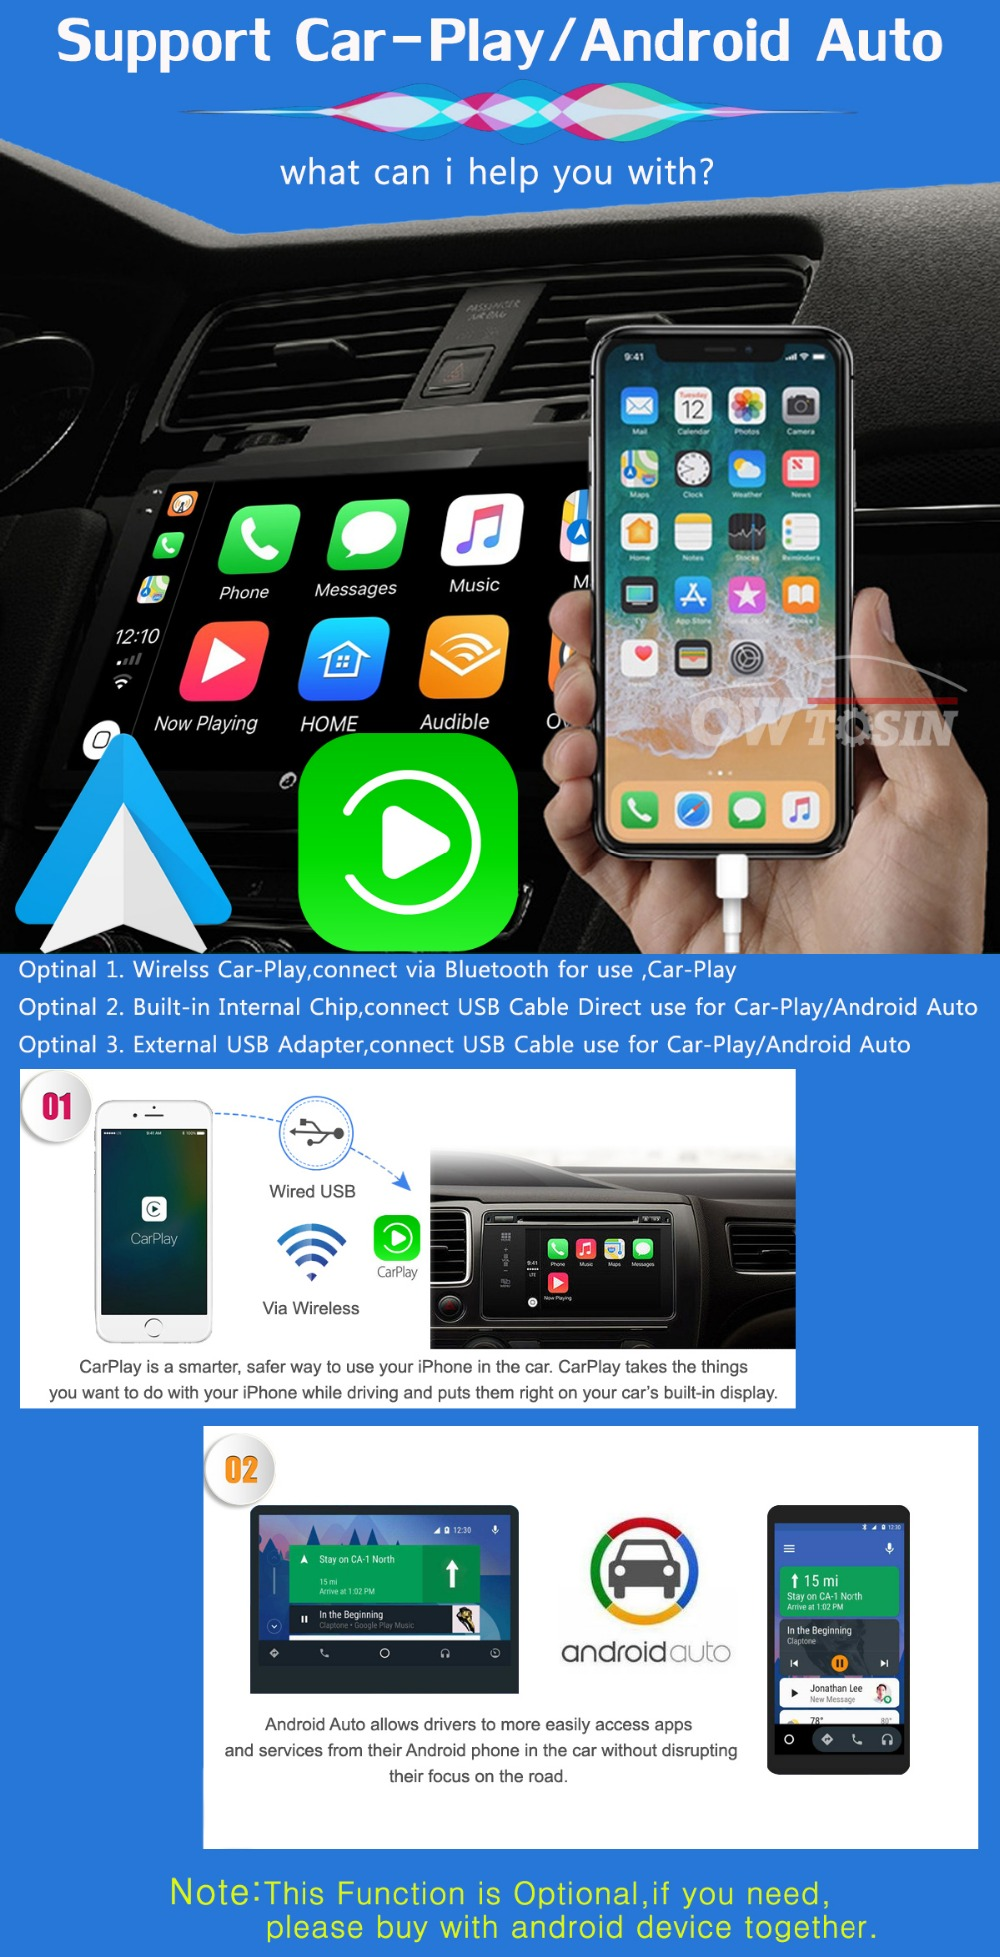 "Top 7"" PX6 4G+64G 2 Din Android 9.0 Car DVD Multimedia Player For KIA Ceed 2009 2010 2011 2012 Venga Radio GPS Navigation DSP CarPla 7"